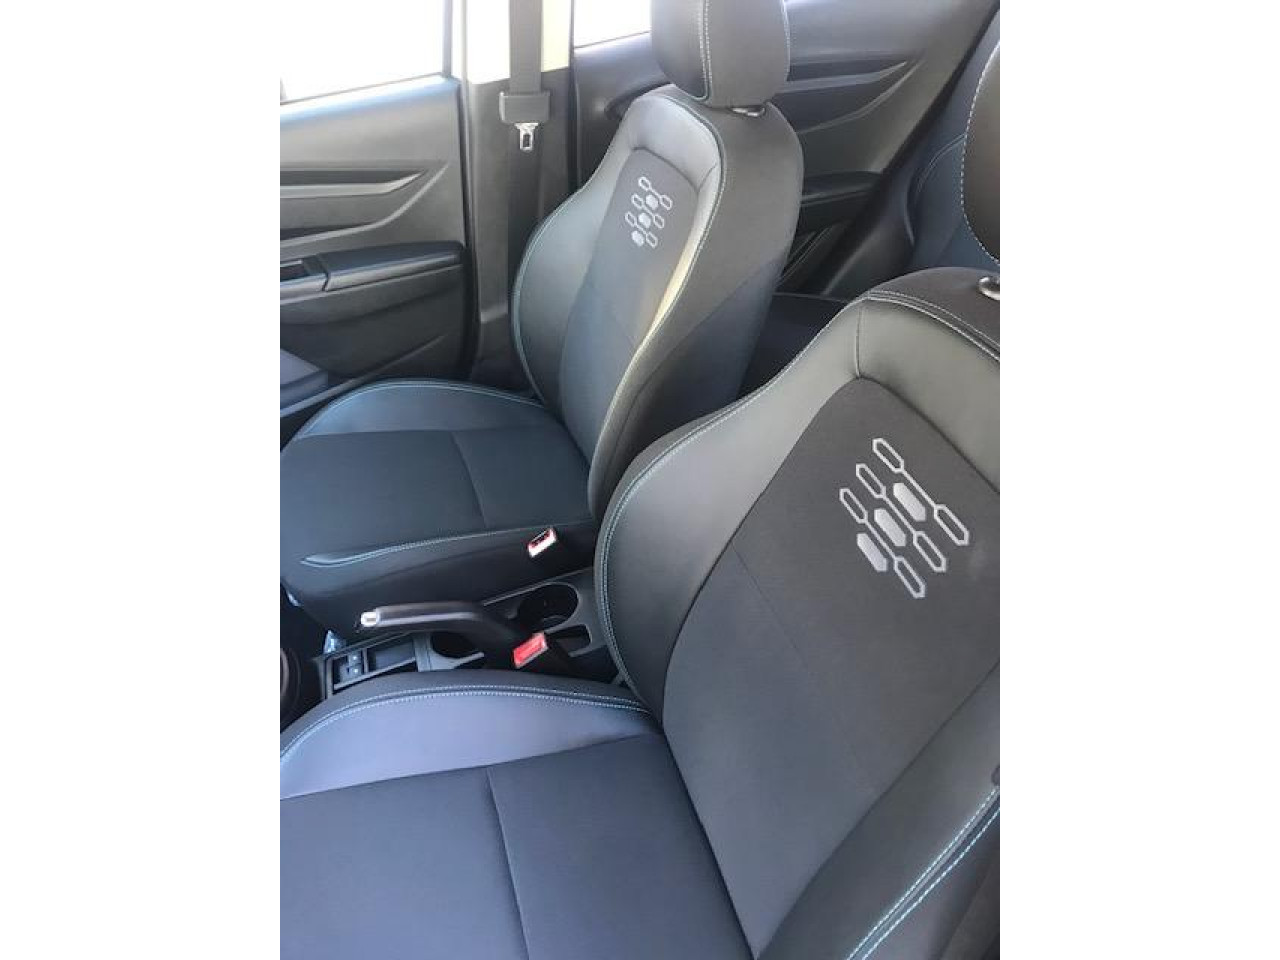 Onix Hatch 1.0 4P FLEX JOY BLACK